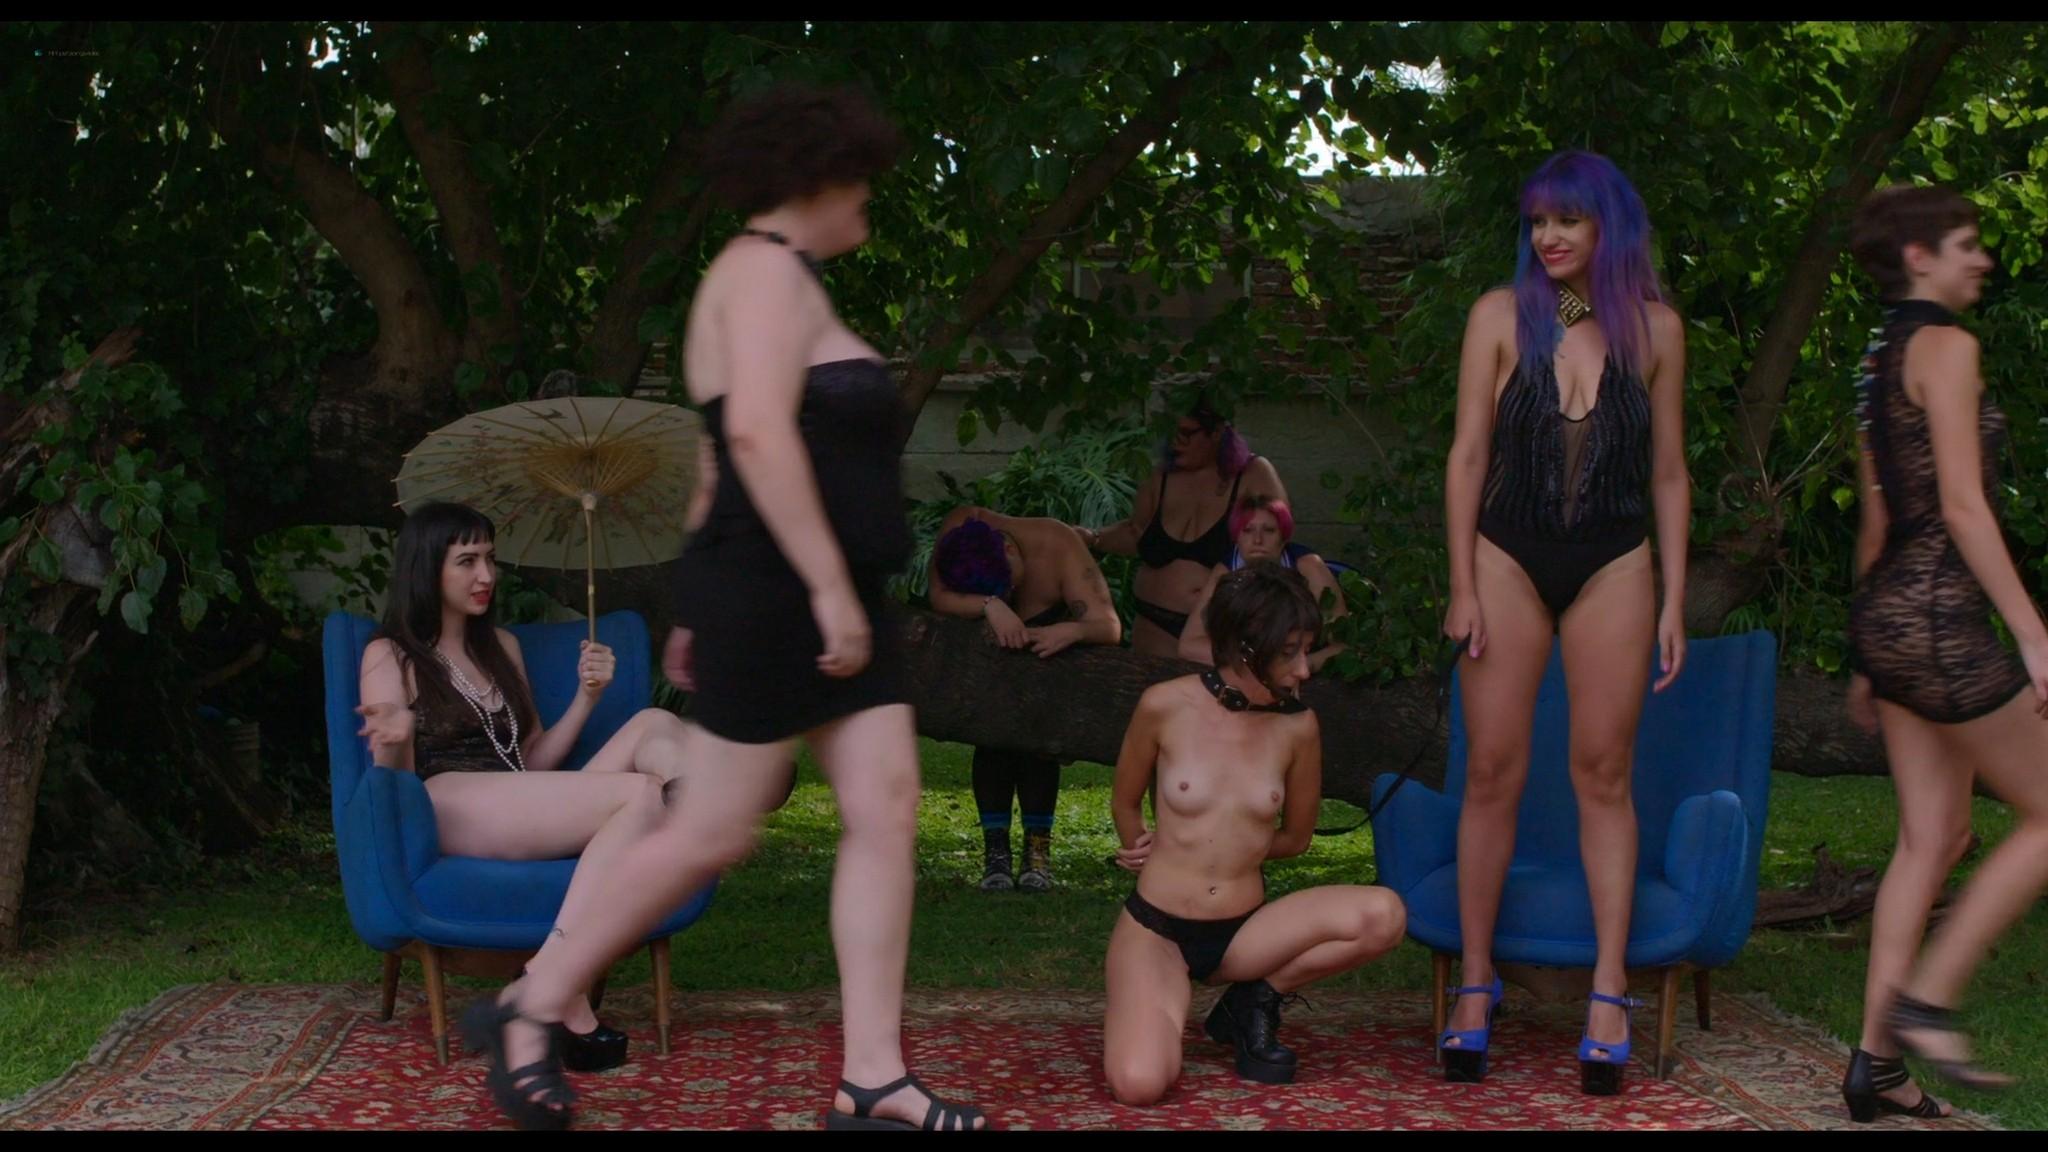 Sofia Gala Castiglione nude explicit Erica Rivas and others nude explicit lesbian sex The Daughters of Fire 2018 1080p Web 15